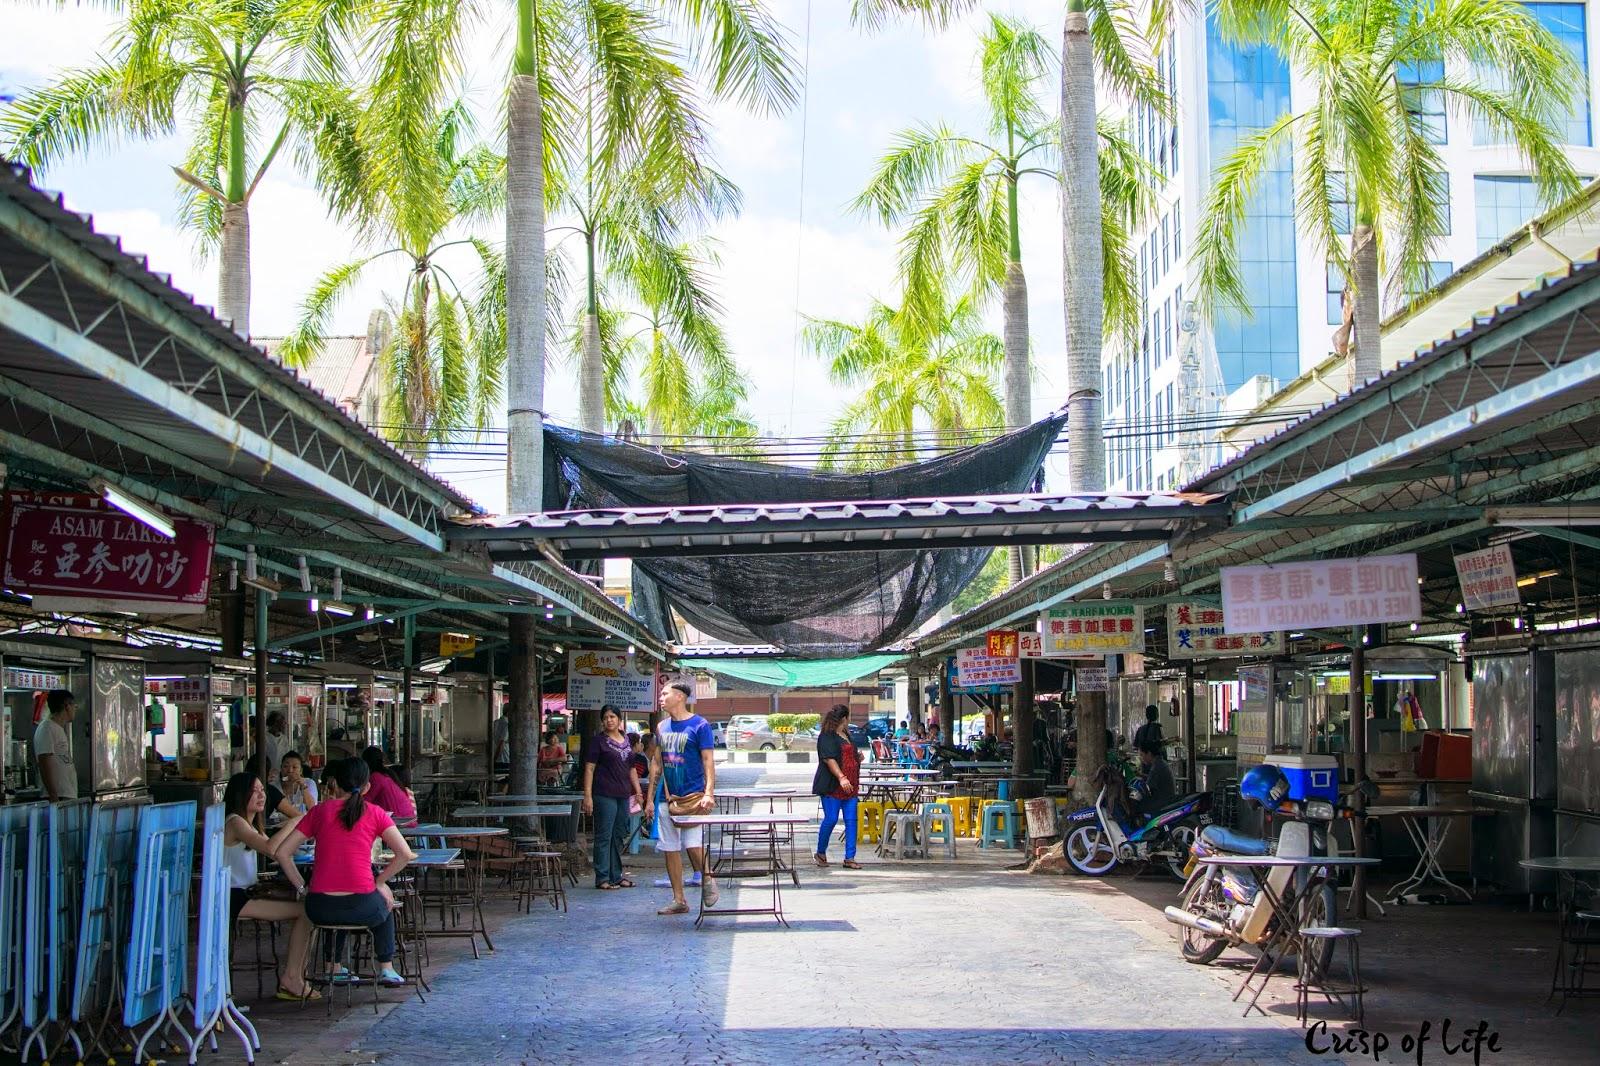 Sungai Petani Food Pengkalan Street 二街